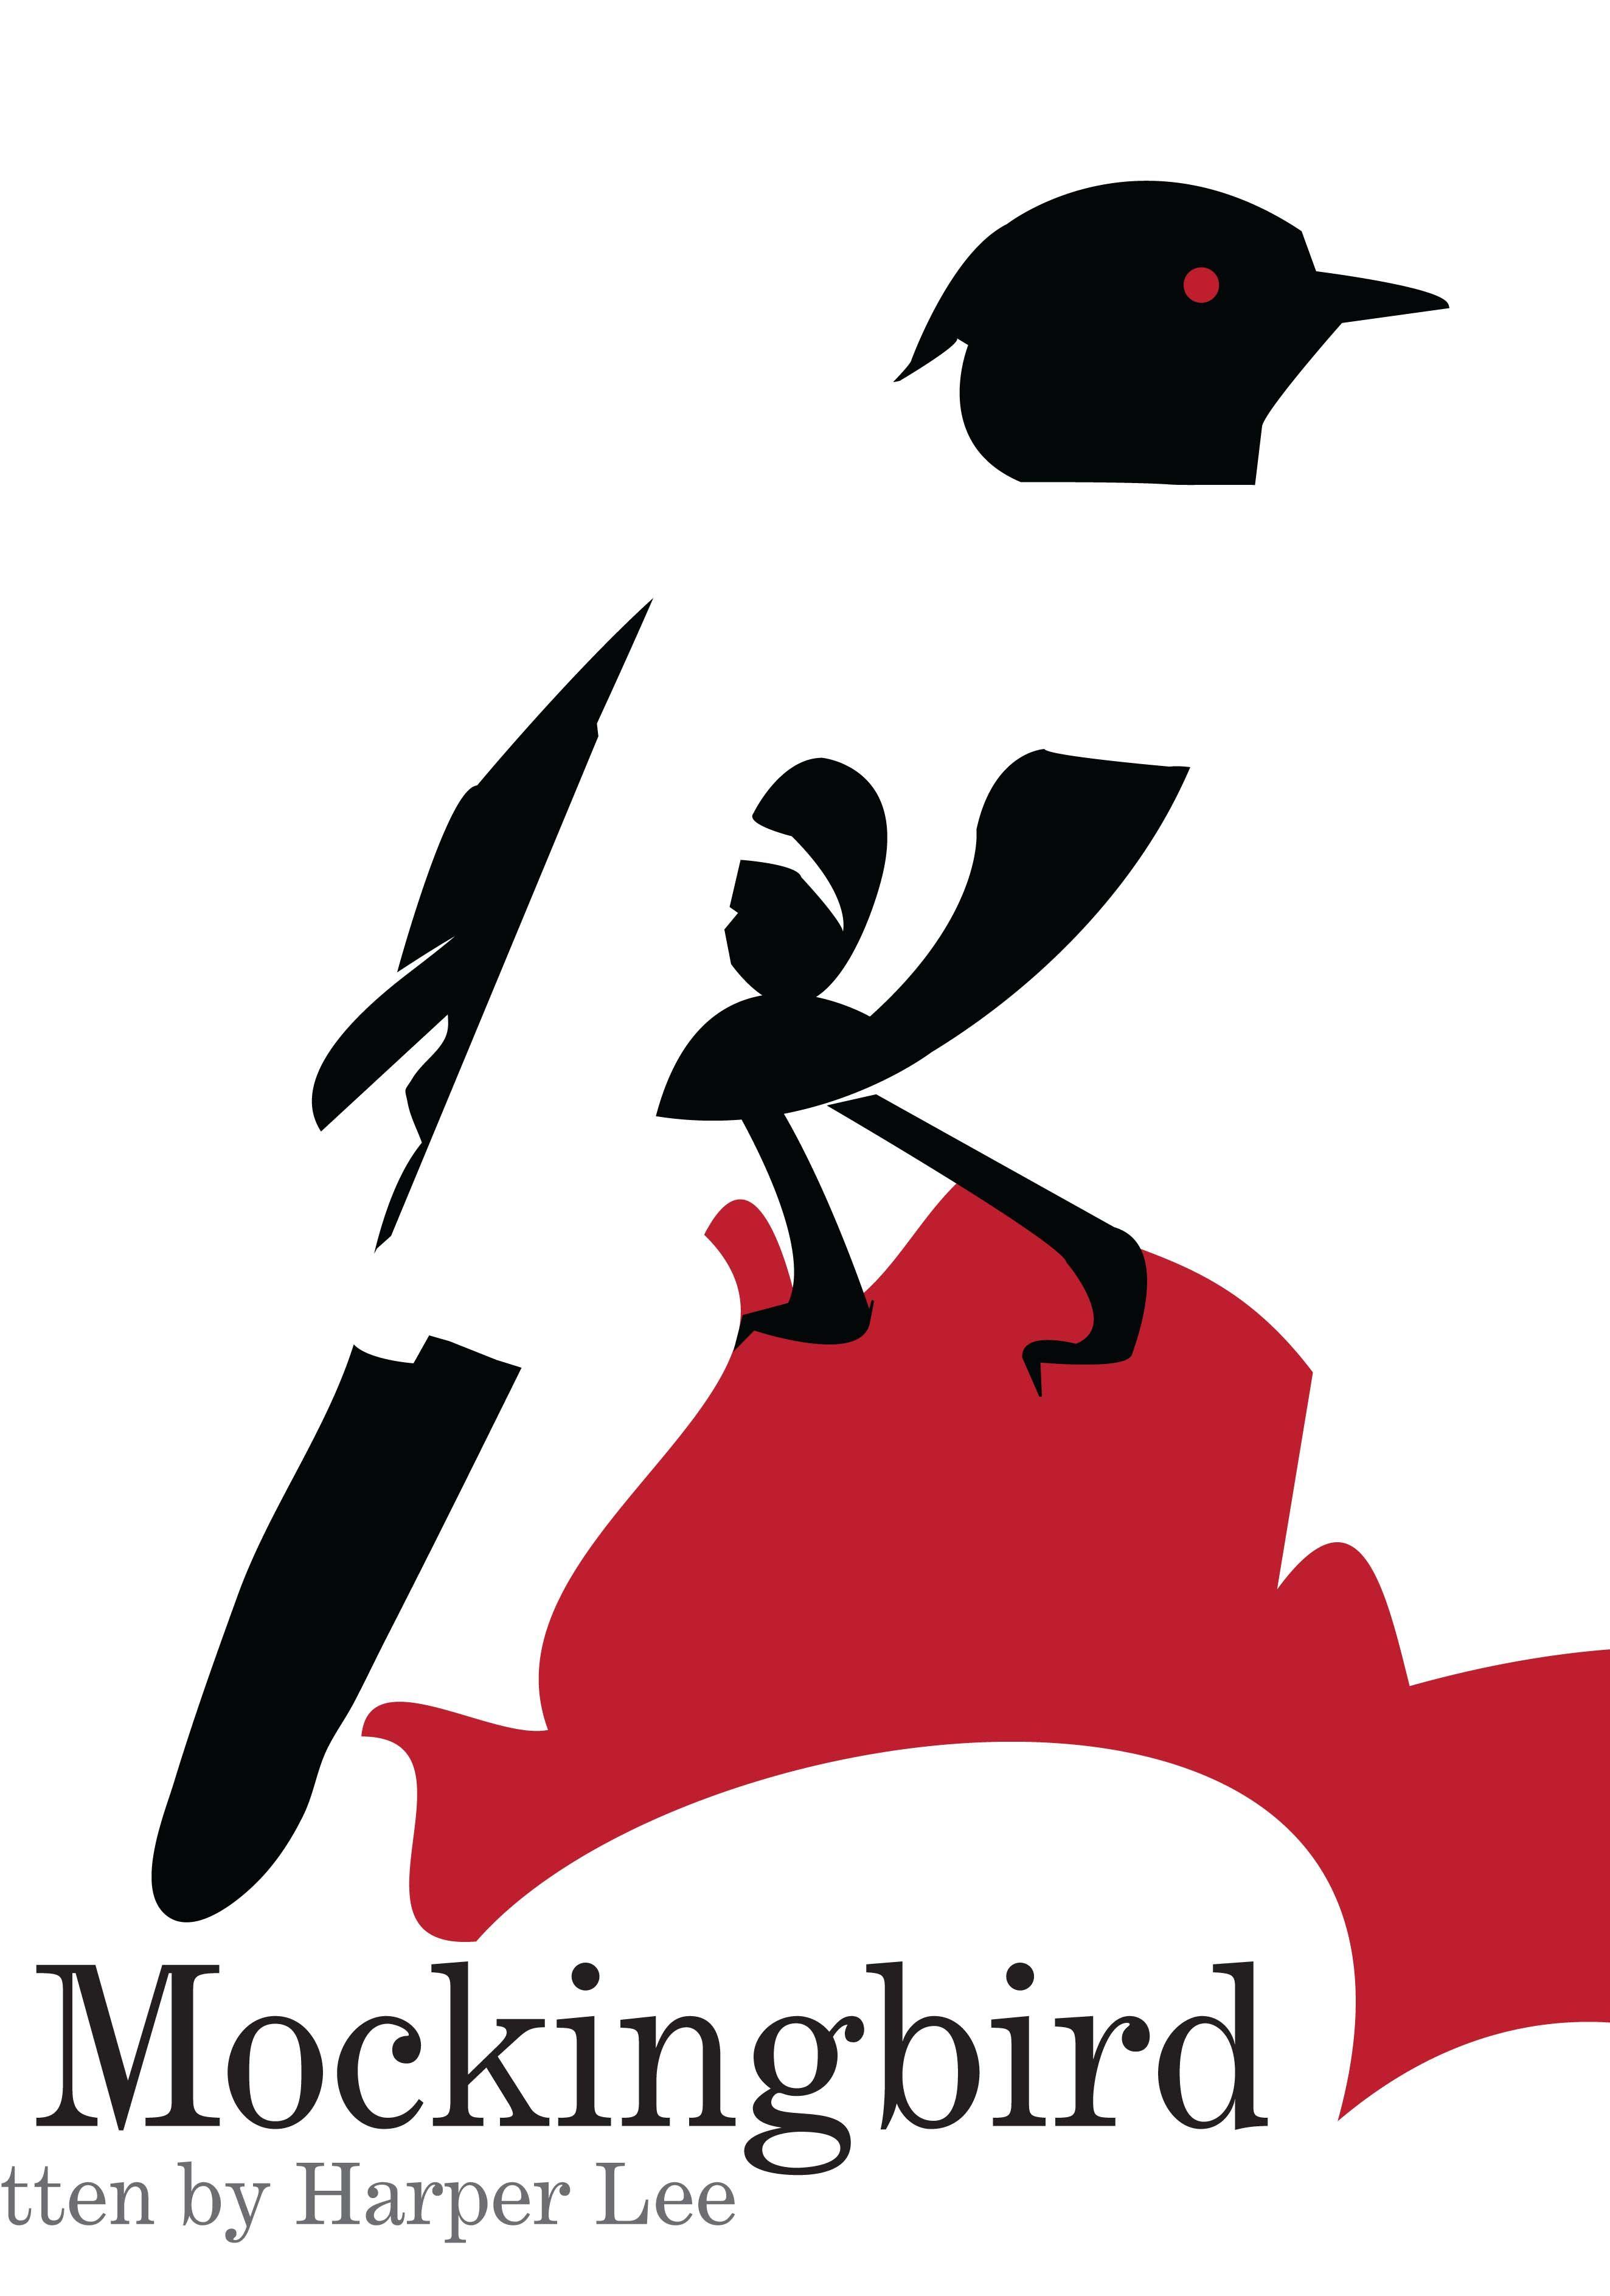 Kill mockingbird scrapbook ideas - The Name Of The Book Is To Kill A Mockingbird I Believe That Bob Ewell Killed The Figurative Mockingbird Mr Robinson Bob Ewell Pinterest A Tree